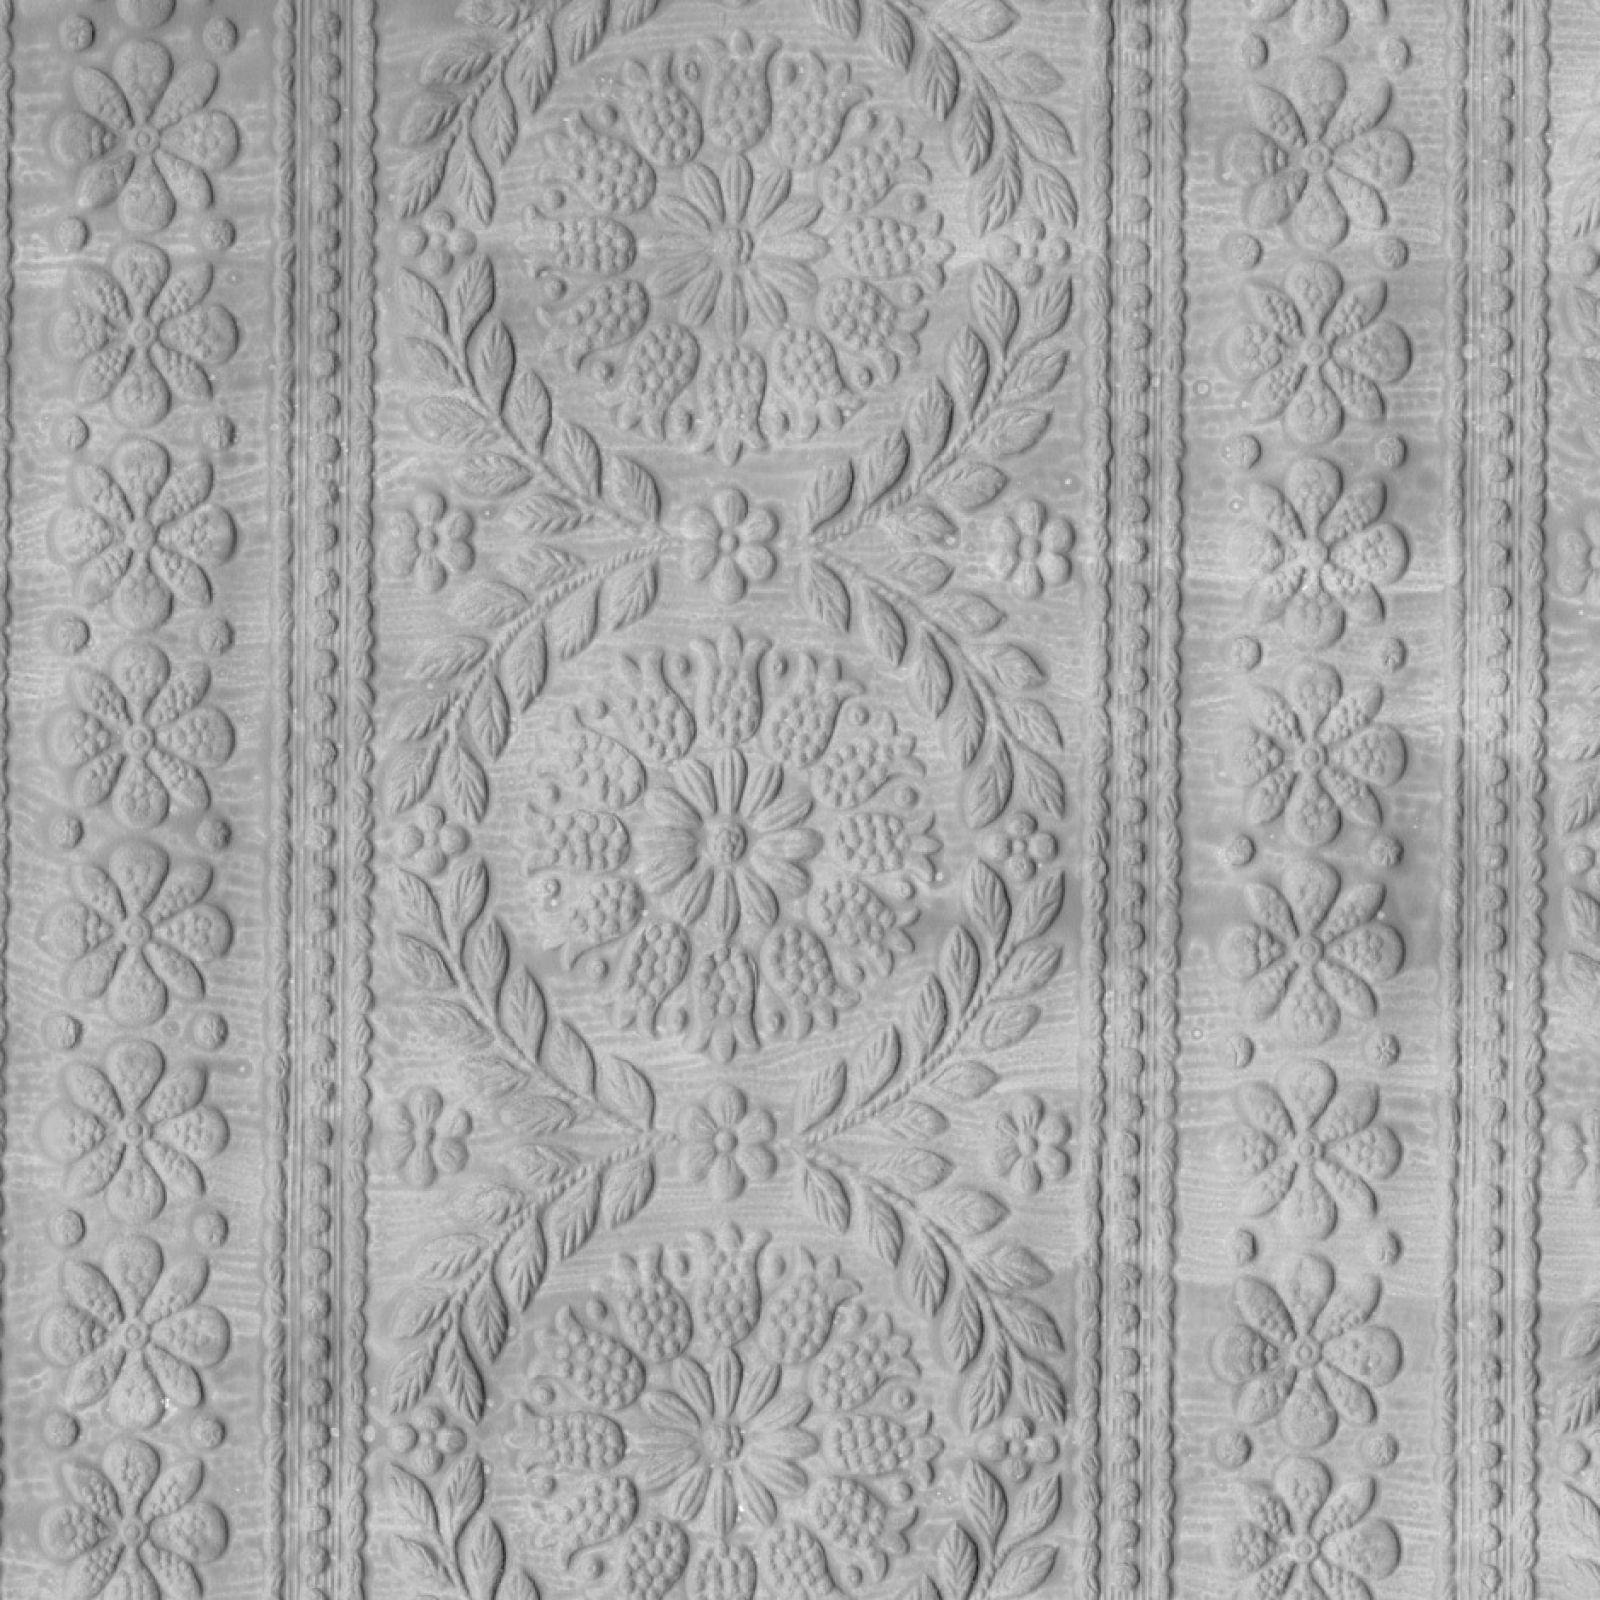 Anaglypta wallpaper ve340 anaglypta wallpapers - Anaglypta wallpaper ...